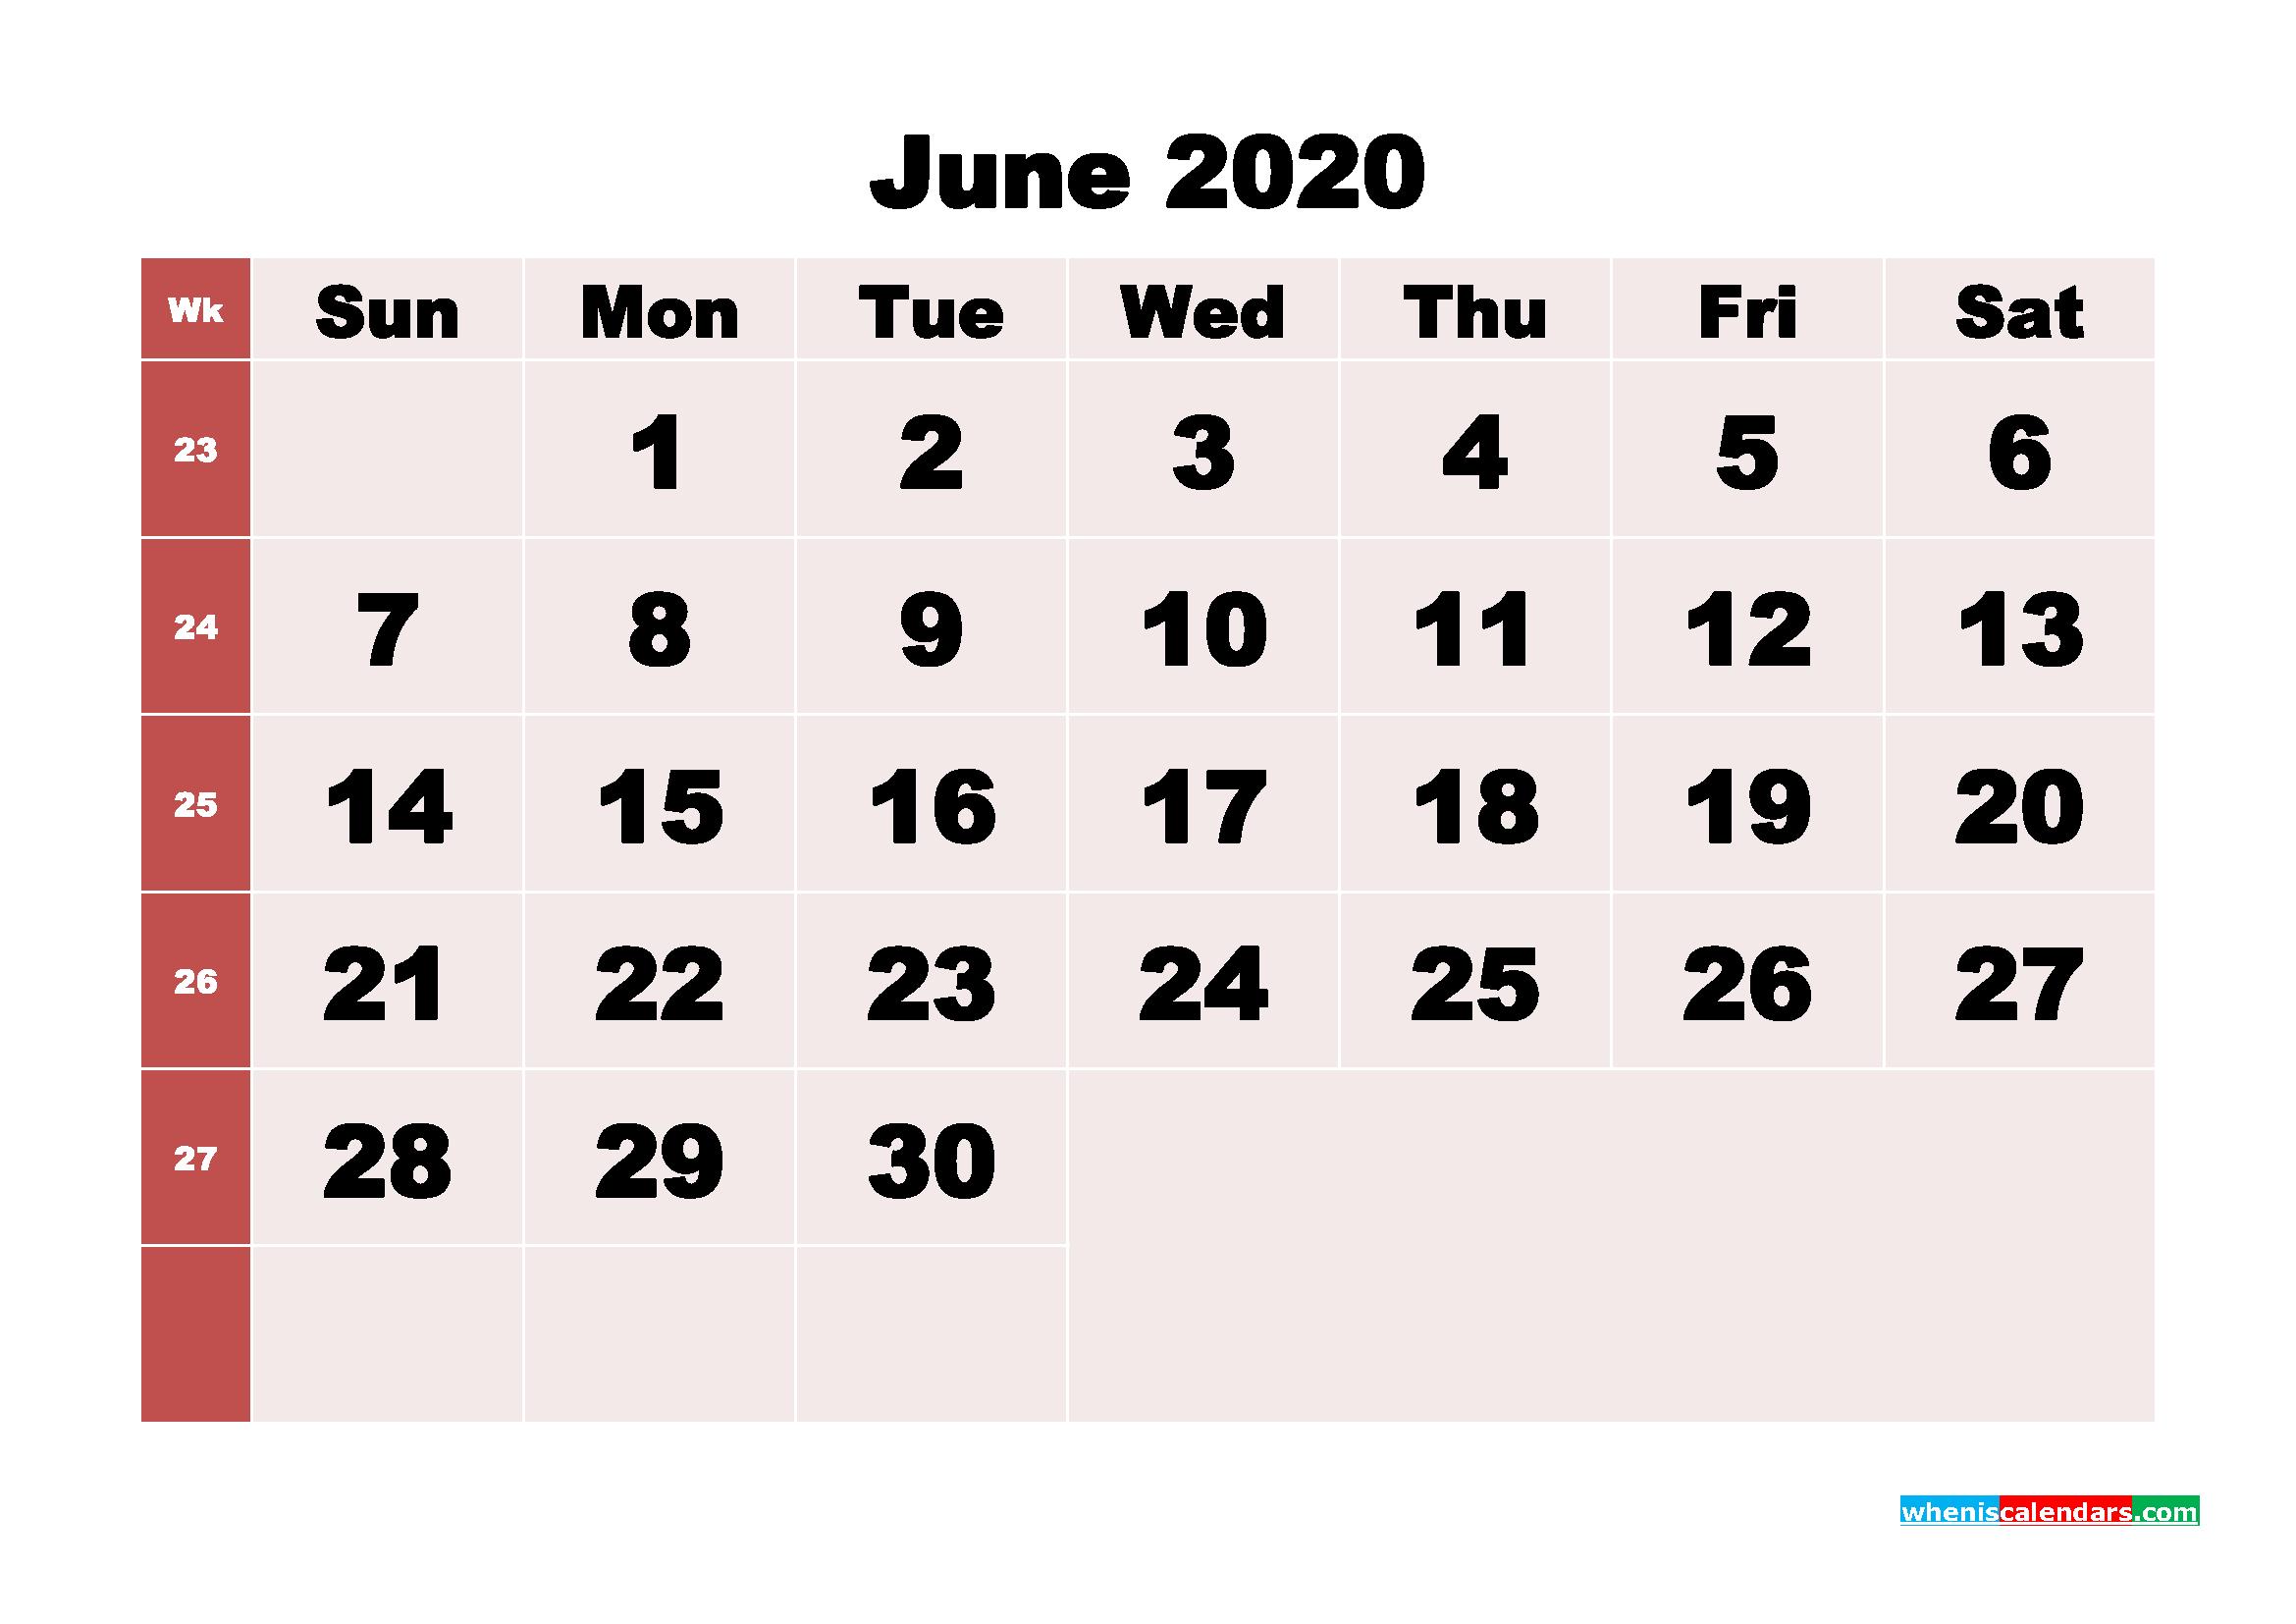 Free Printable June 2020 Calendar - No.m20b246